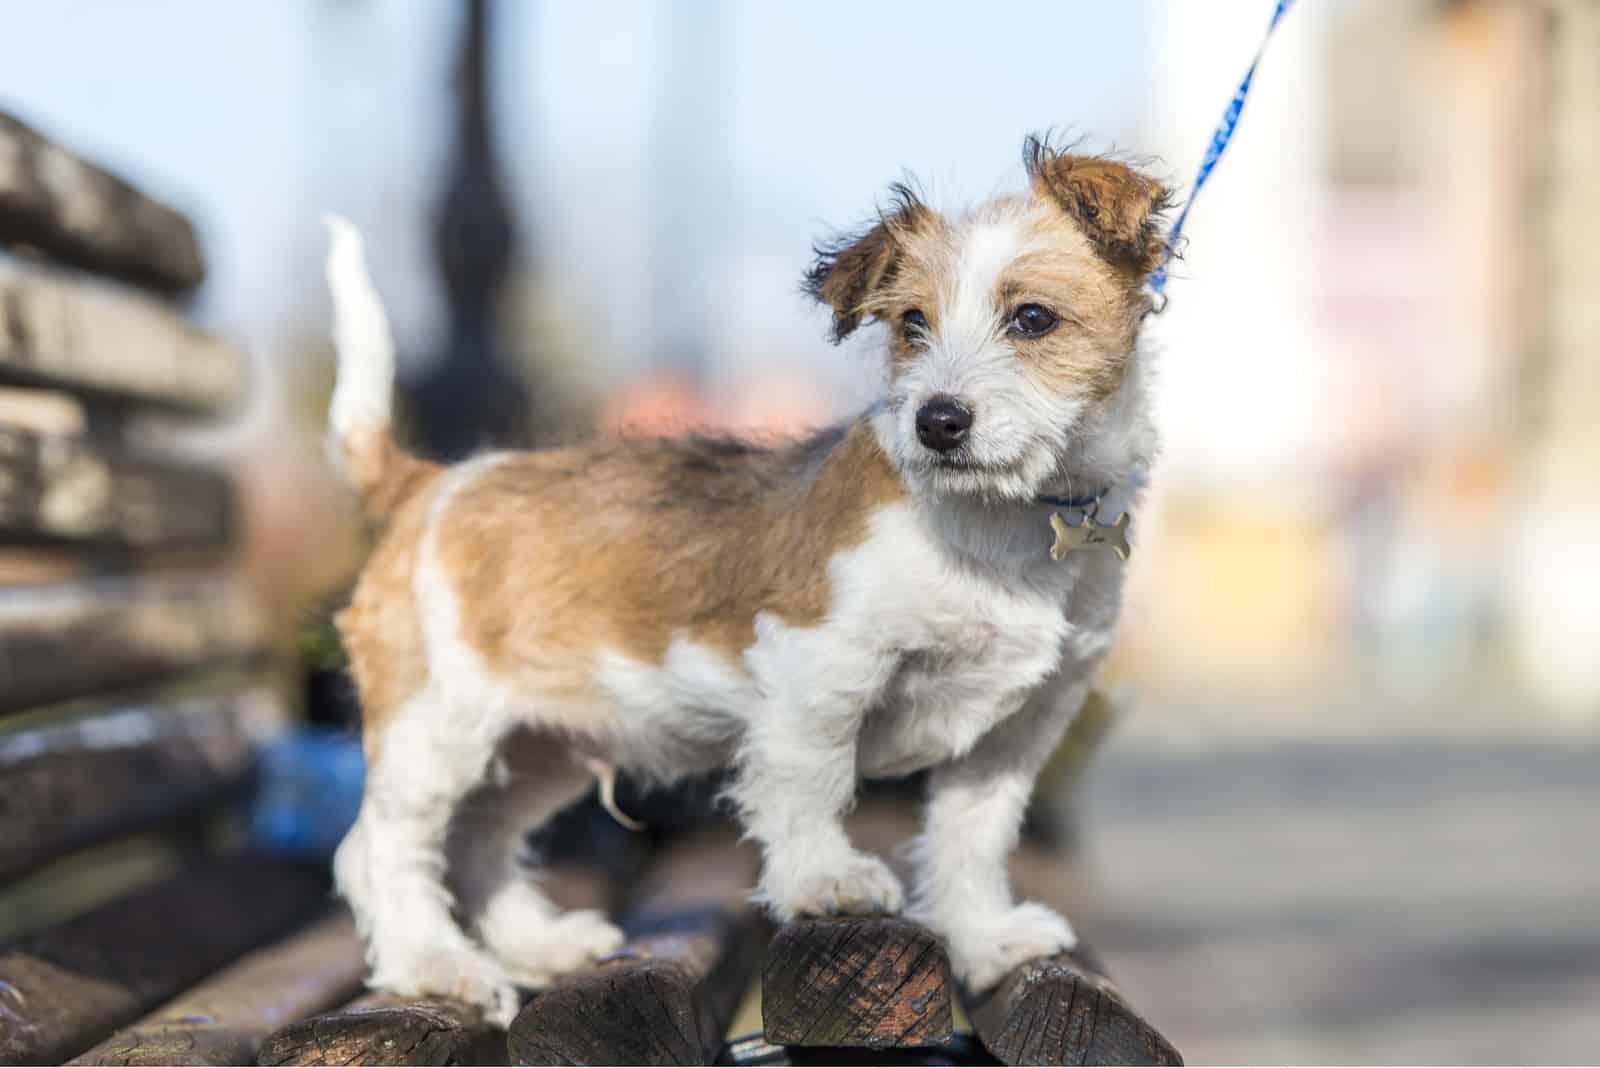 Kromfohrländer Hundewelpe posiert auf Parkbank